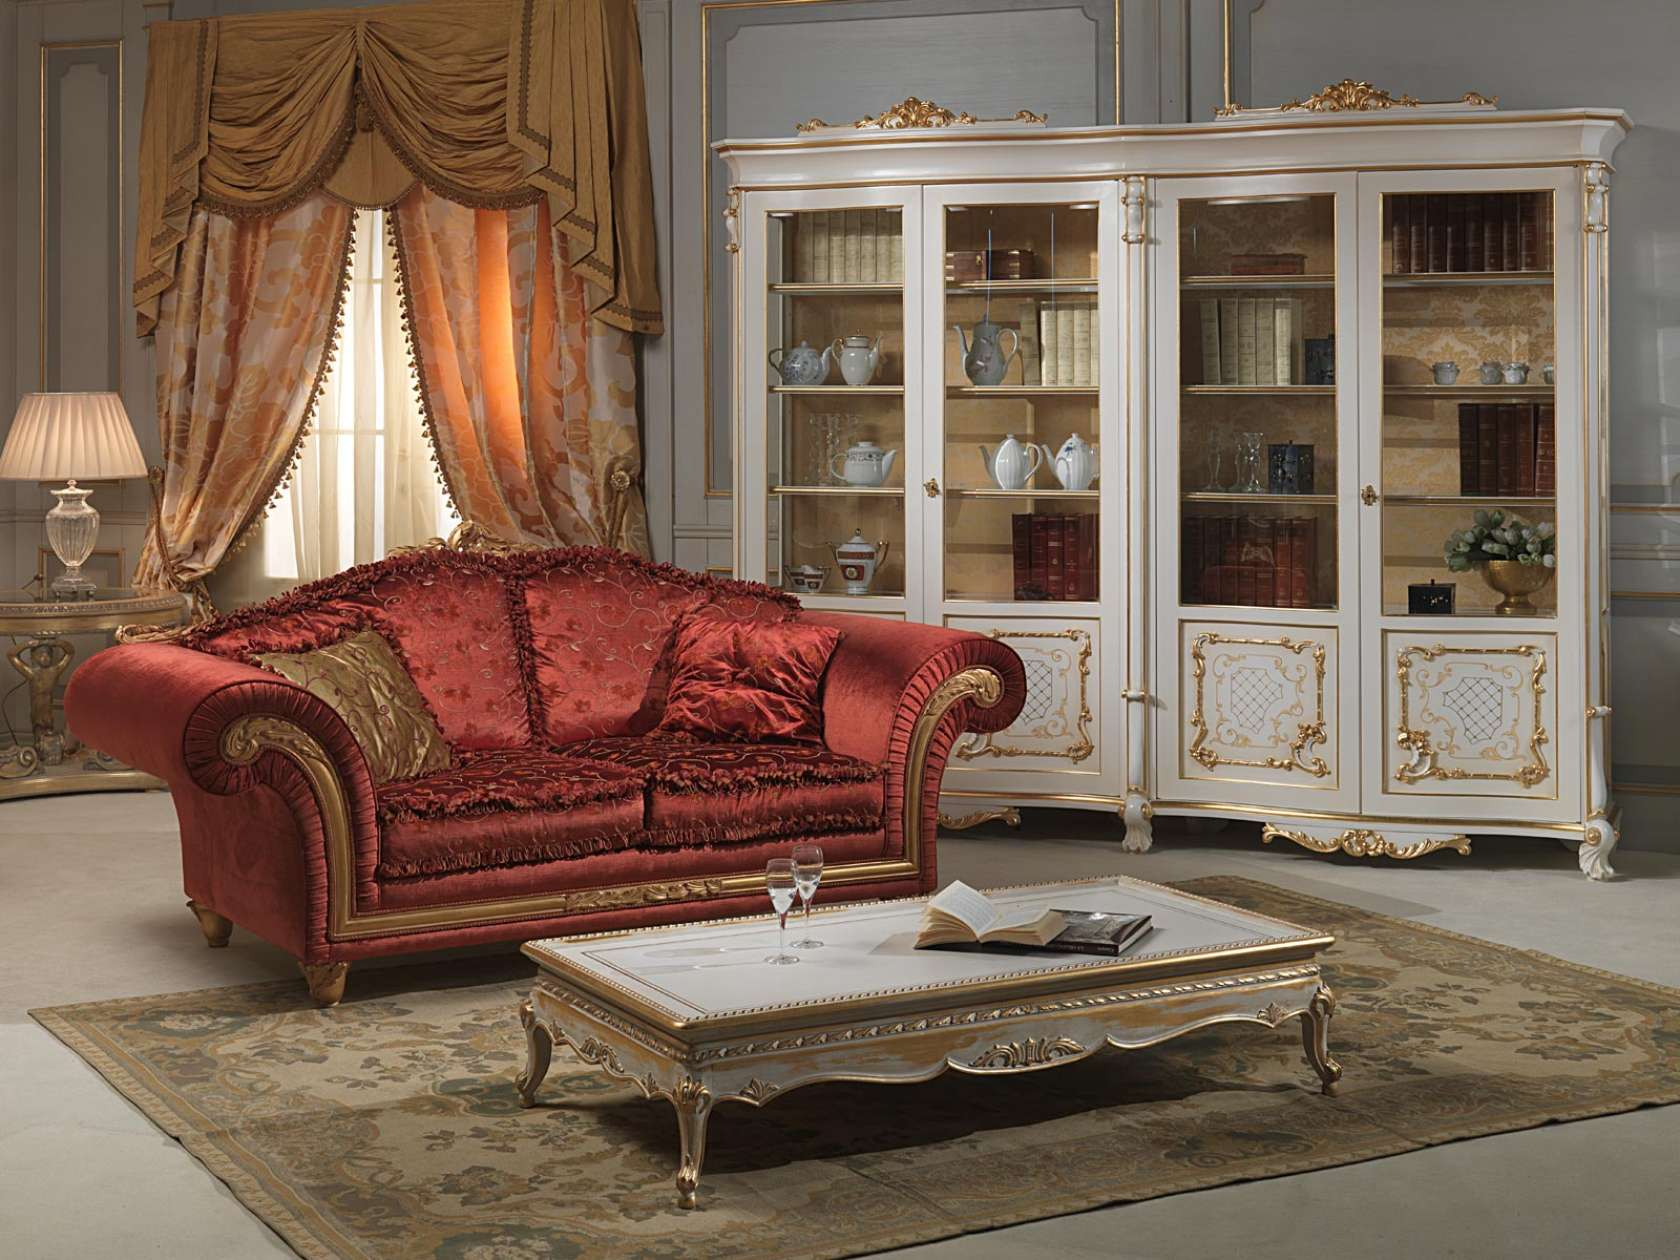 Credenza Con Vetrina In Stile : Salotto con vetrina venezia stile luigi xv vimercati meda